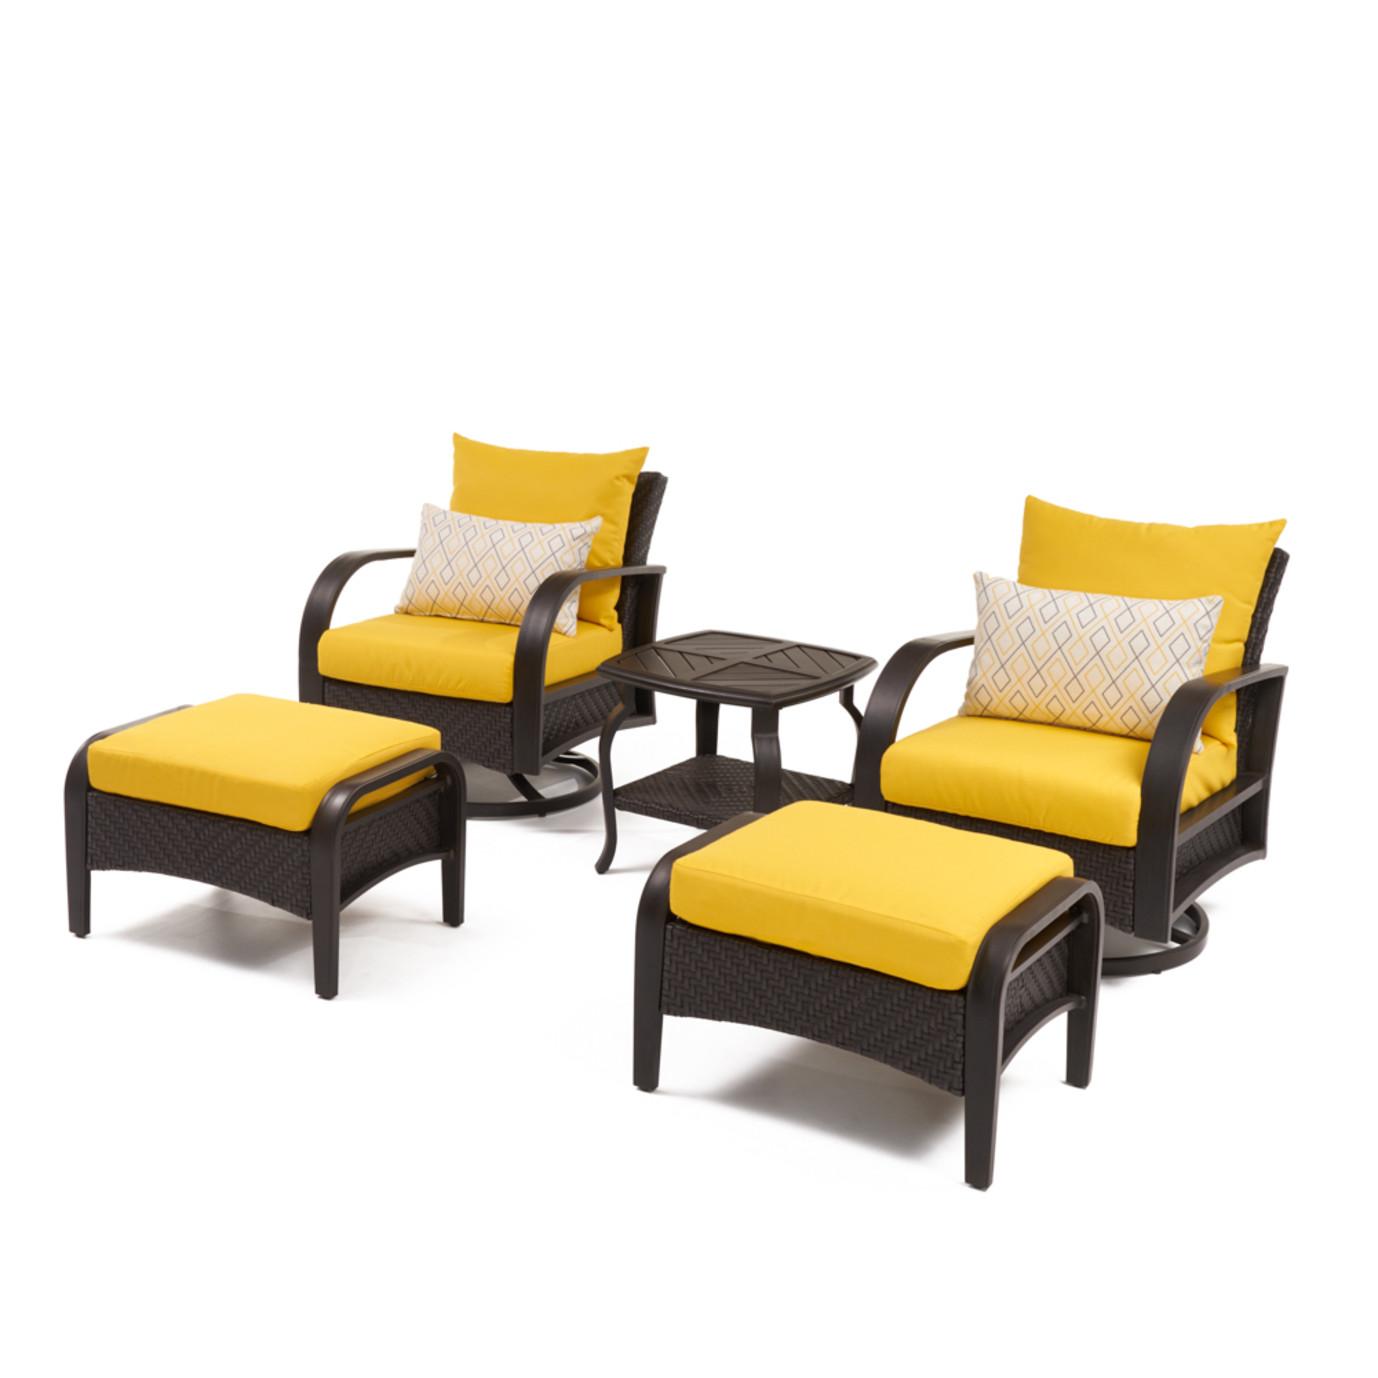 Barcelo™ 5pc Motion Club & Ottoman Set - Sunflower Yellow